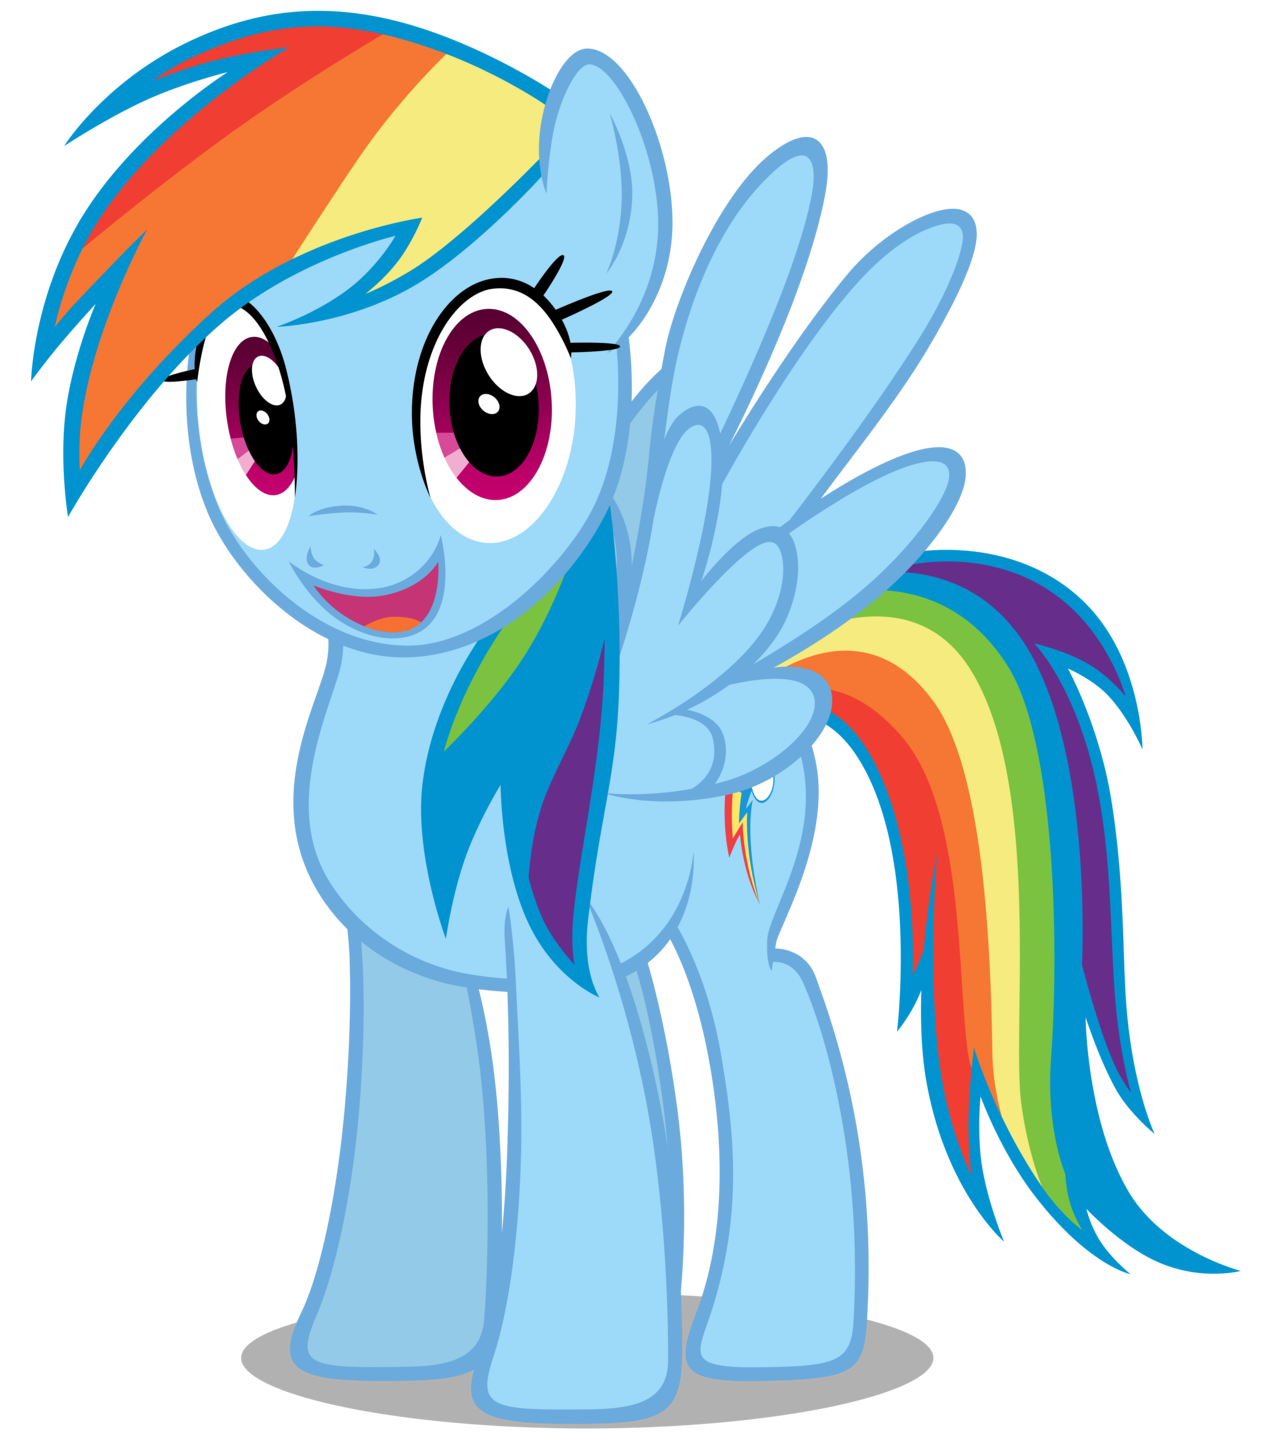 Party Mlp On Pinterest My Little Pony Rainbow Dash